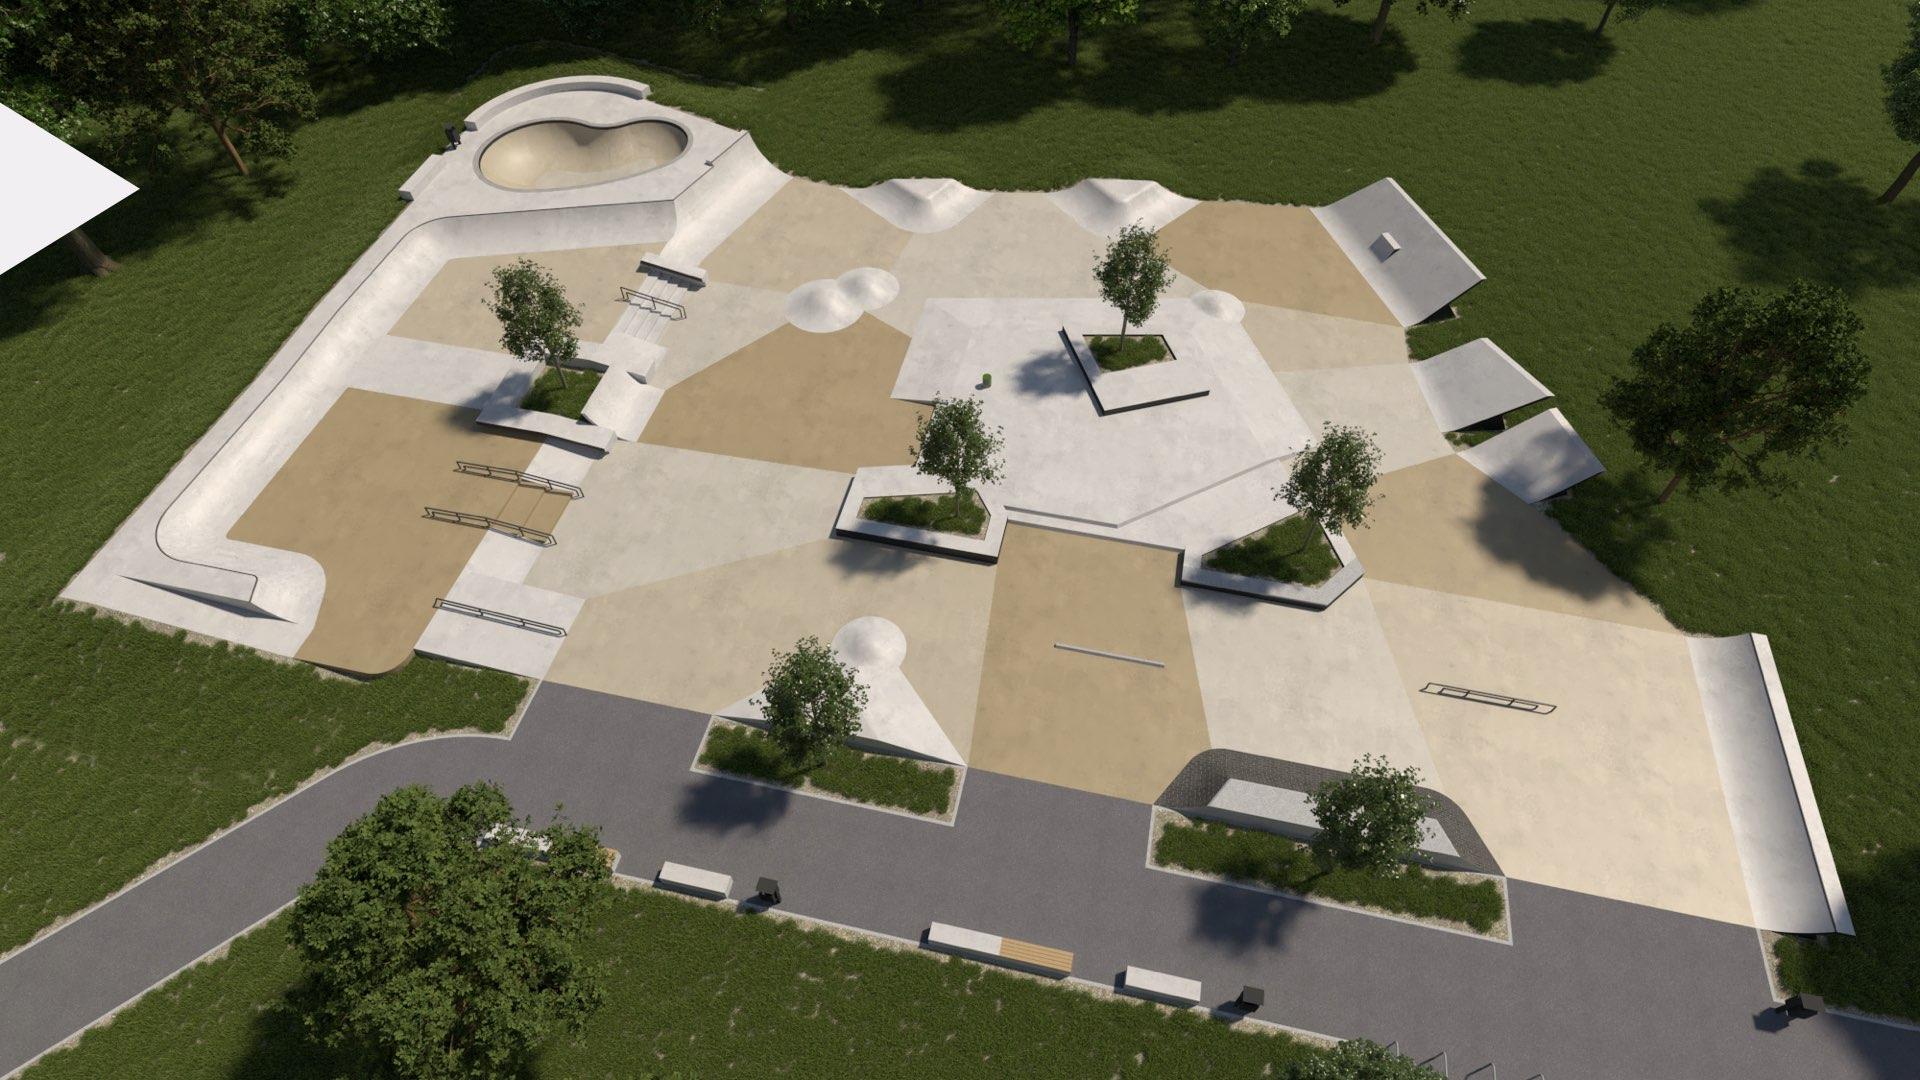 lndskt_skatepark_planung_nrnberg_preview